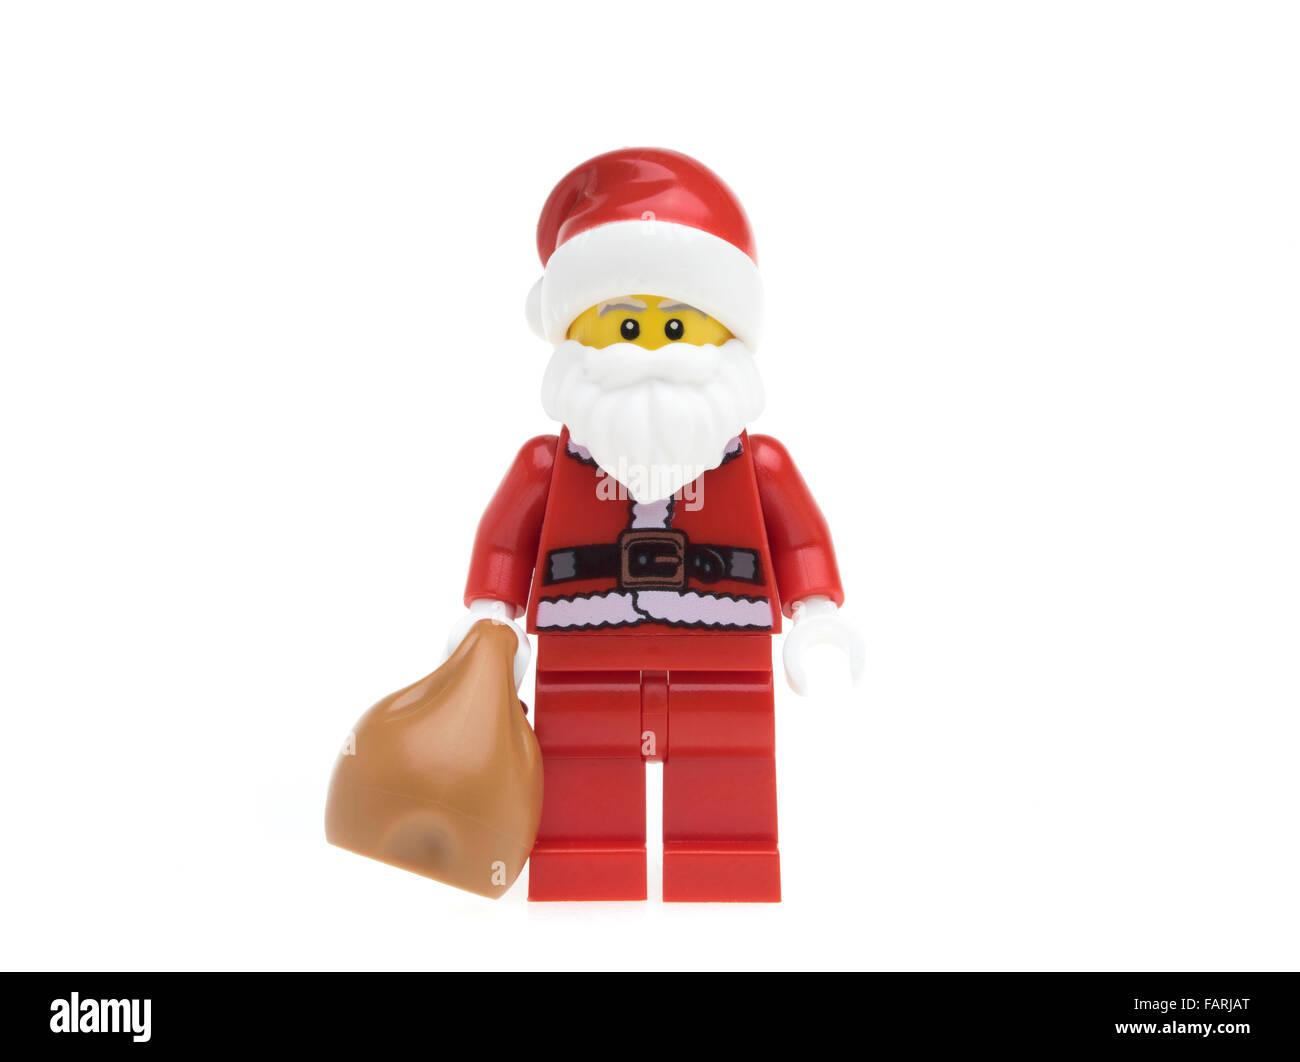 Lego Santa Claus Father Christmas minifigure - Stock Image 4d6f29ef7